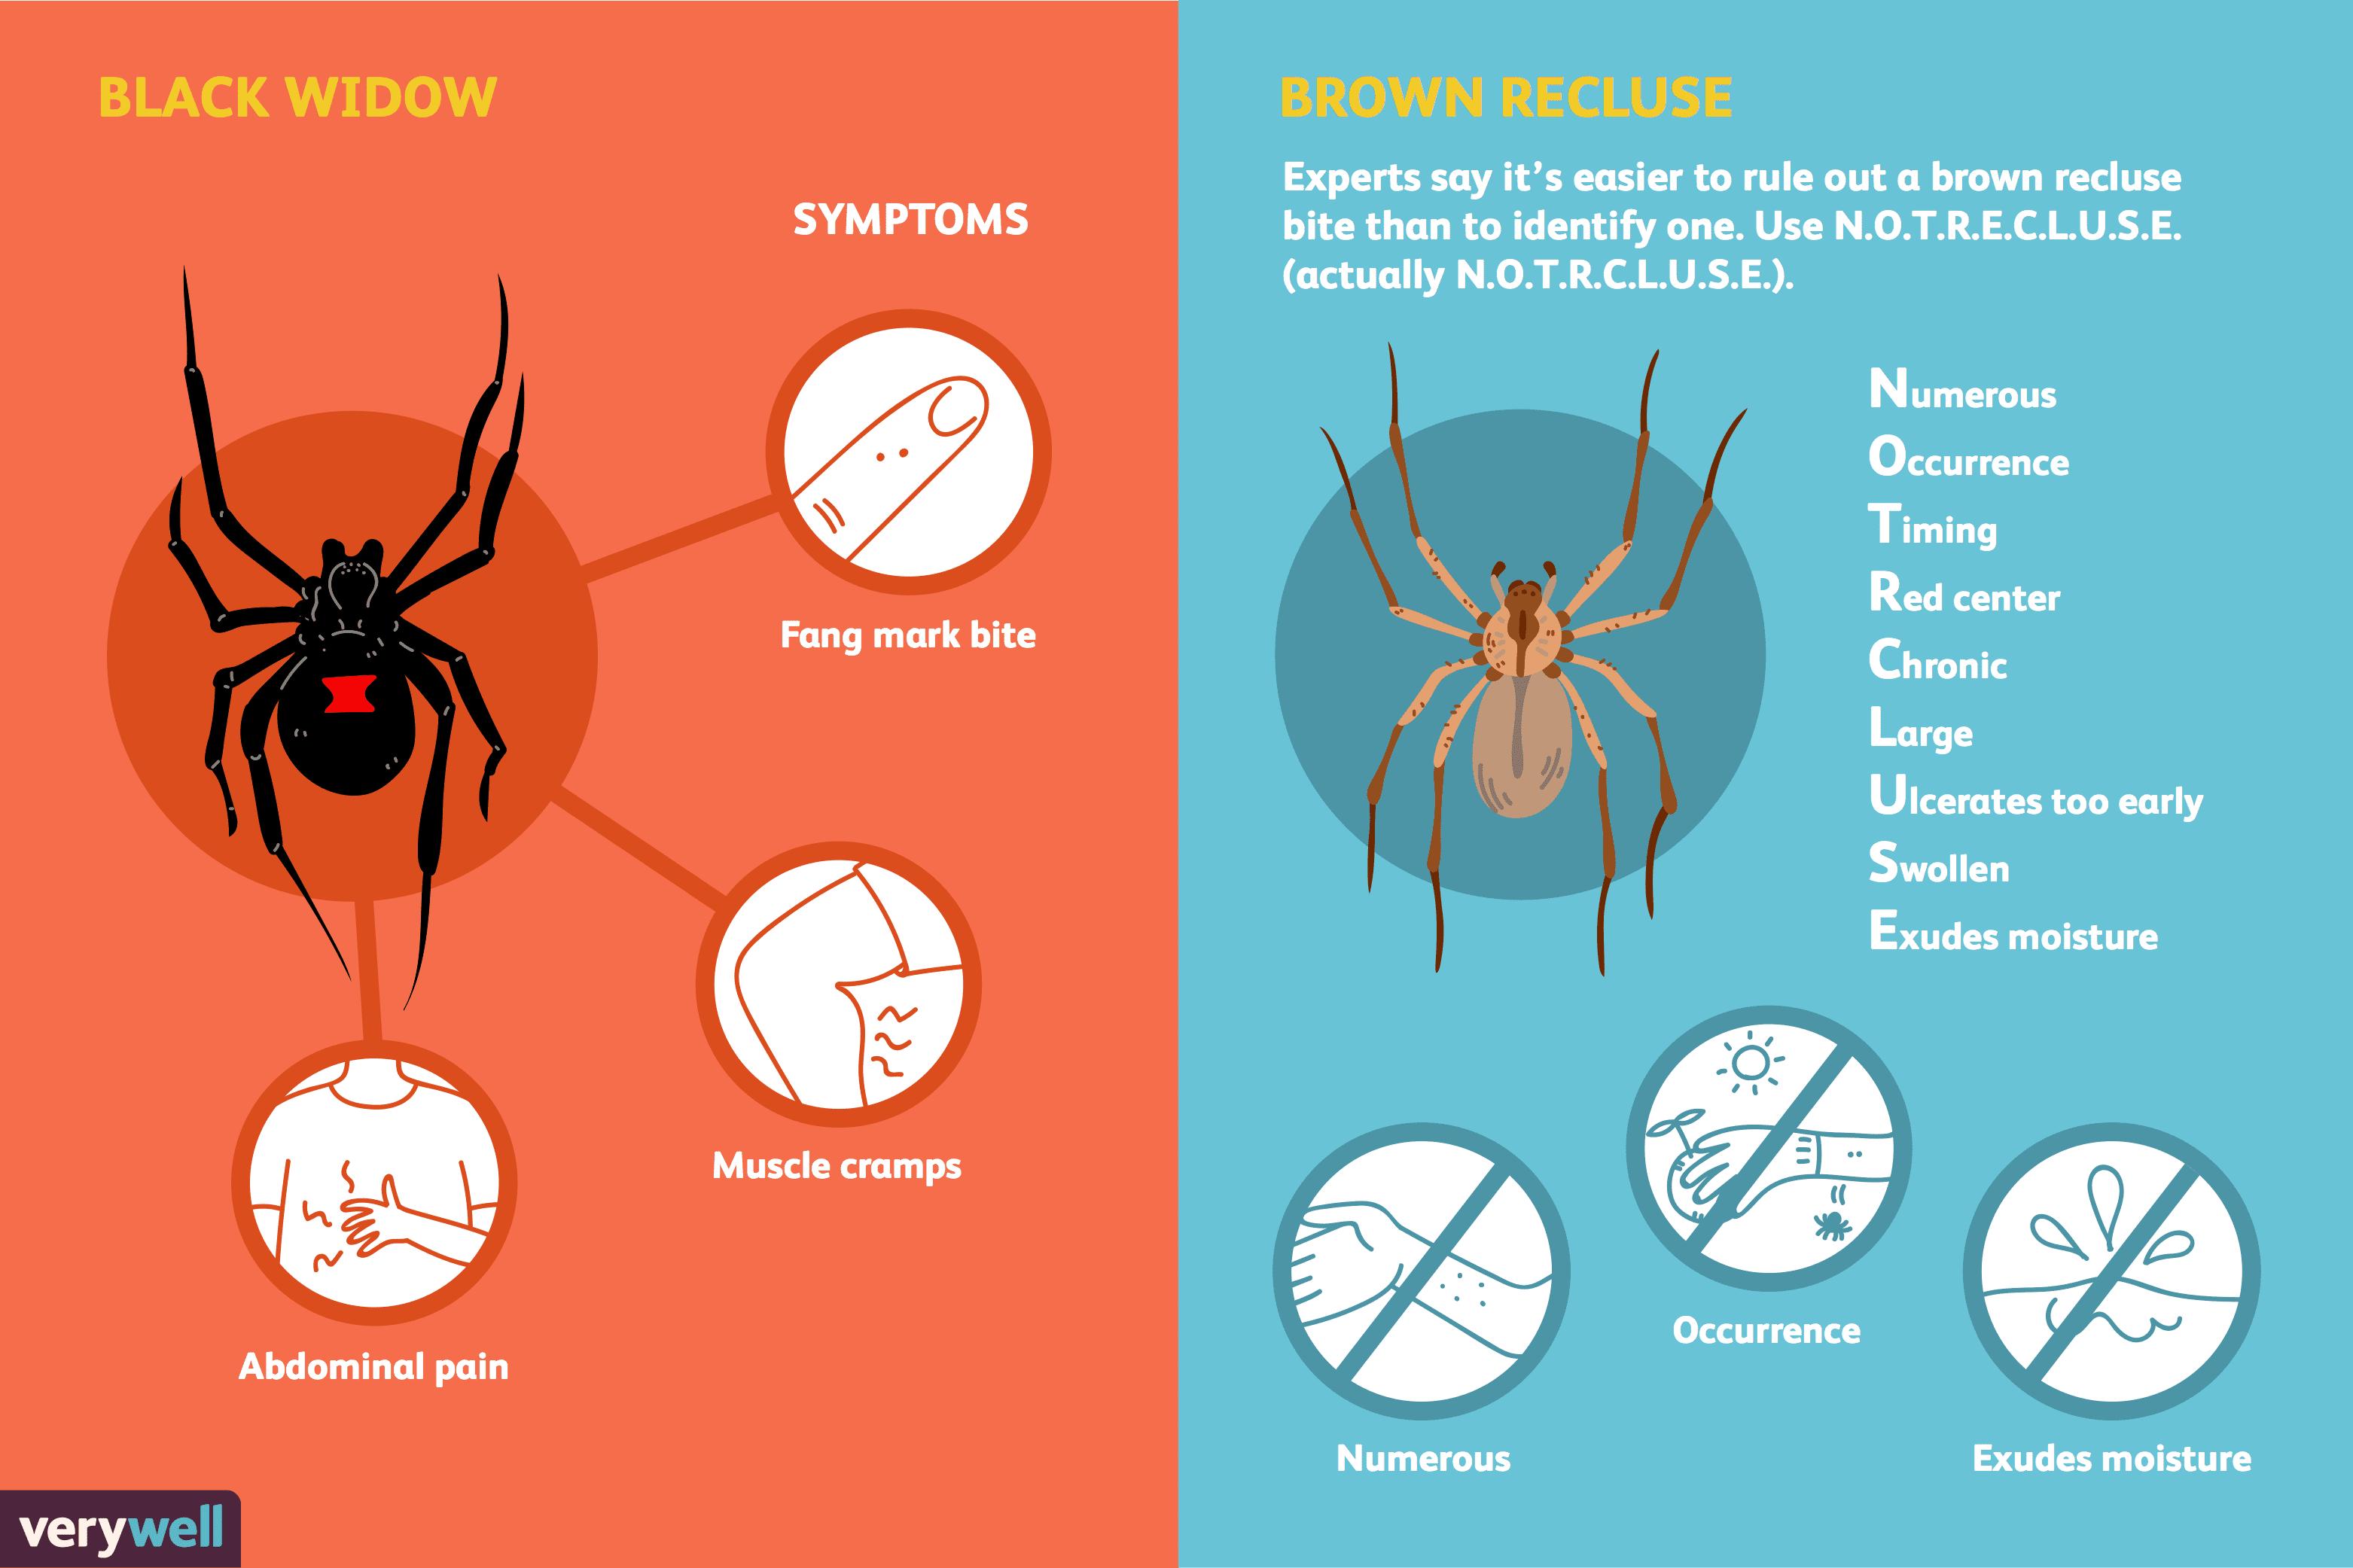 Spider Bites Symptoms, Treatment & Identification